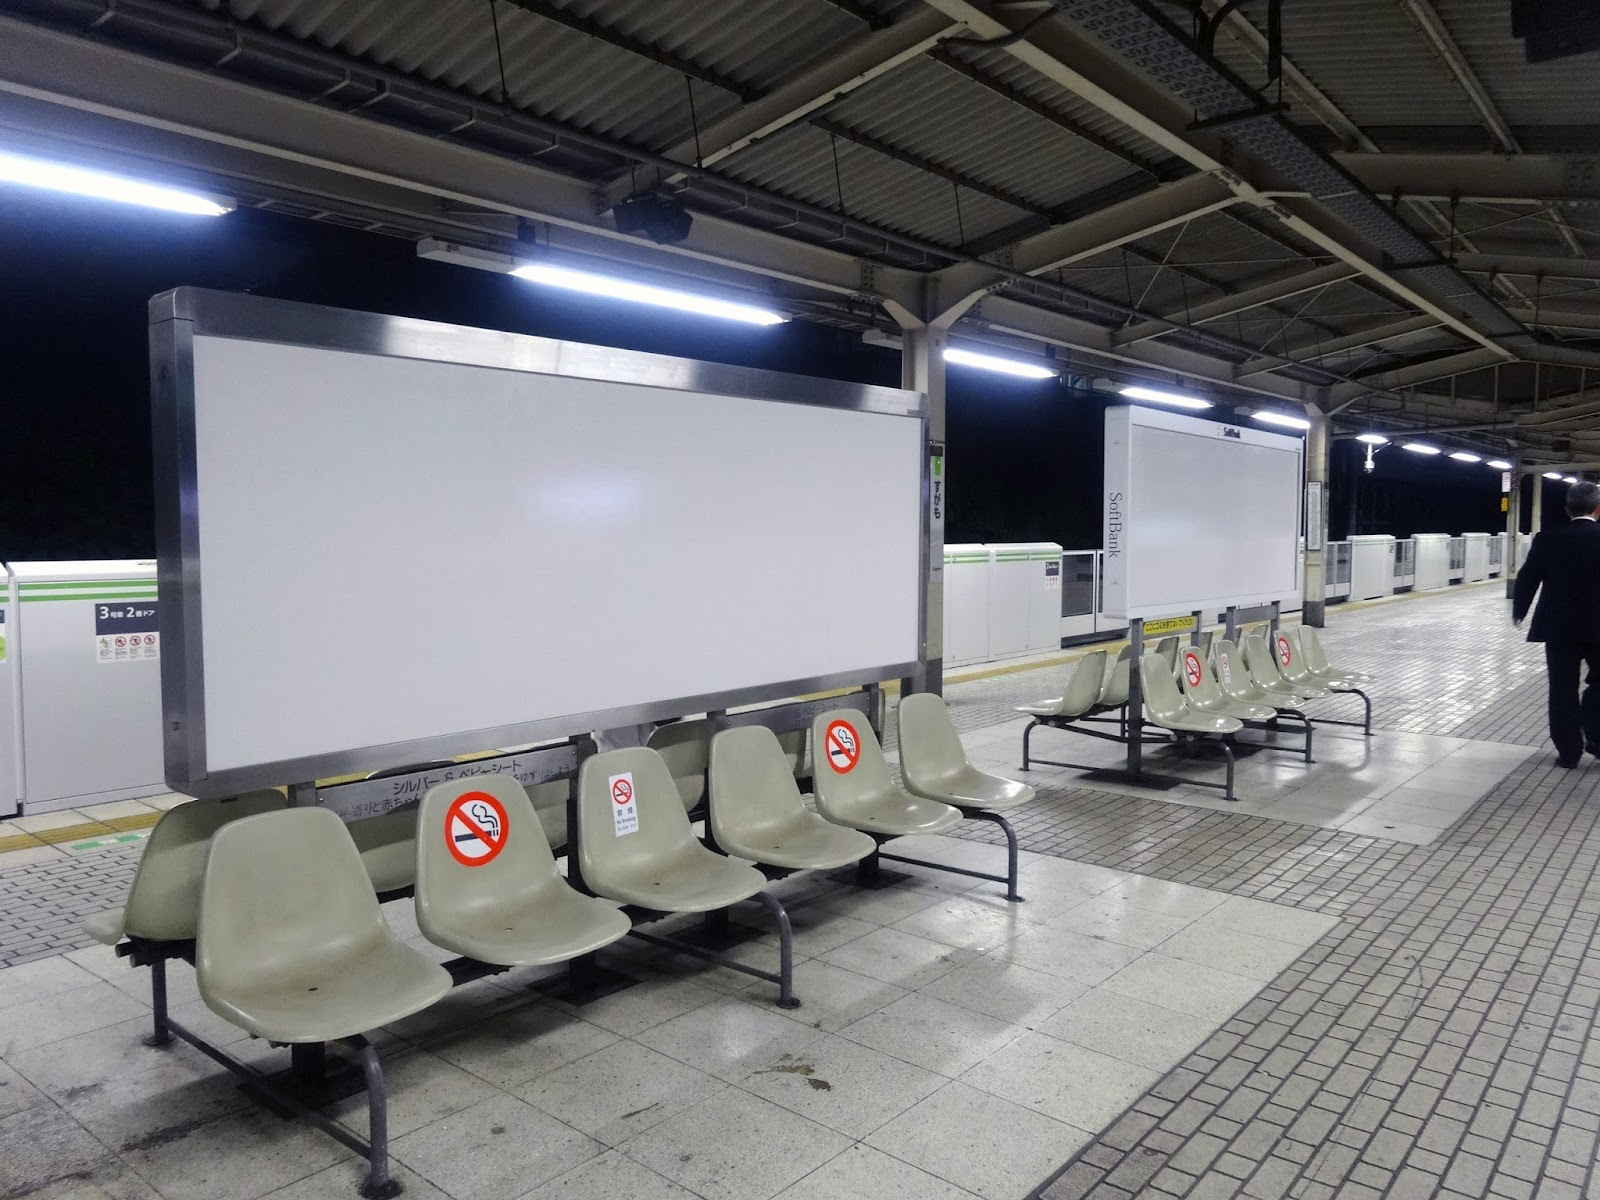 JR巣鴨駅,駅看板,ベンチ〈著作権フリー画像〉Free Stock Photos